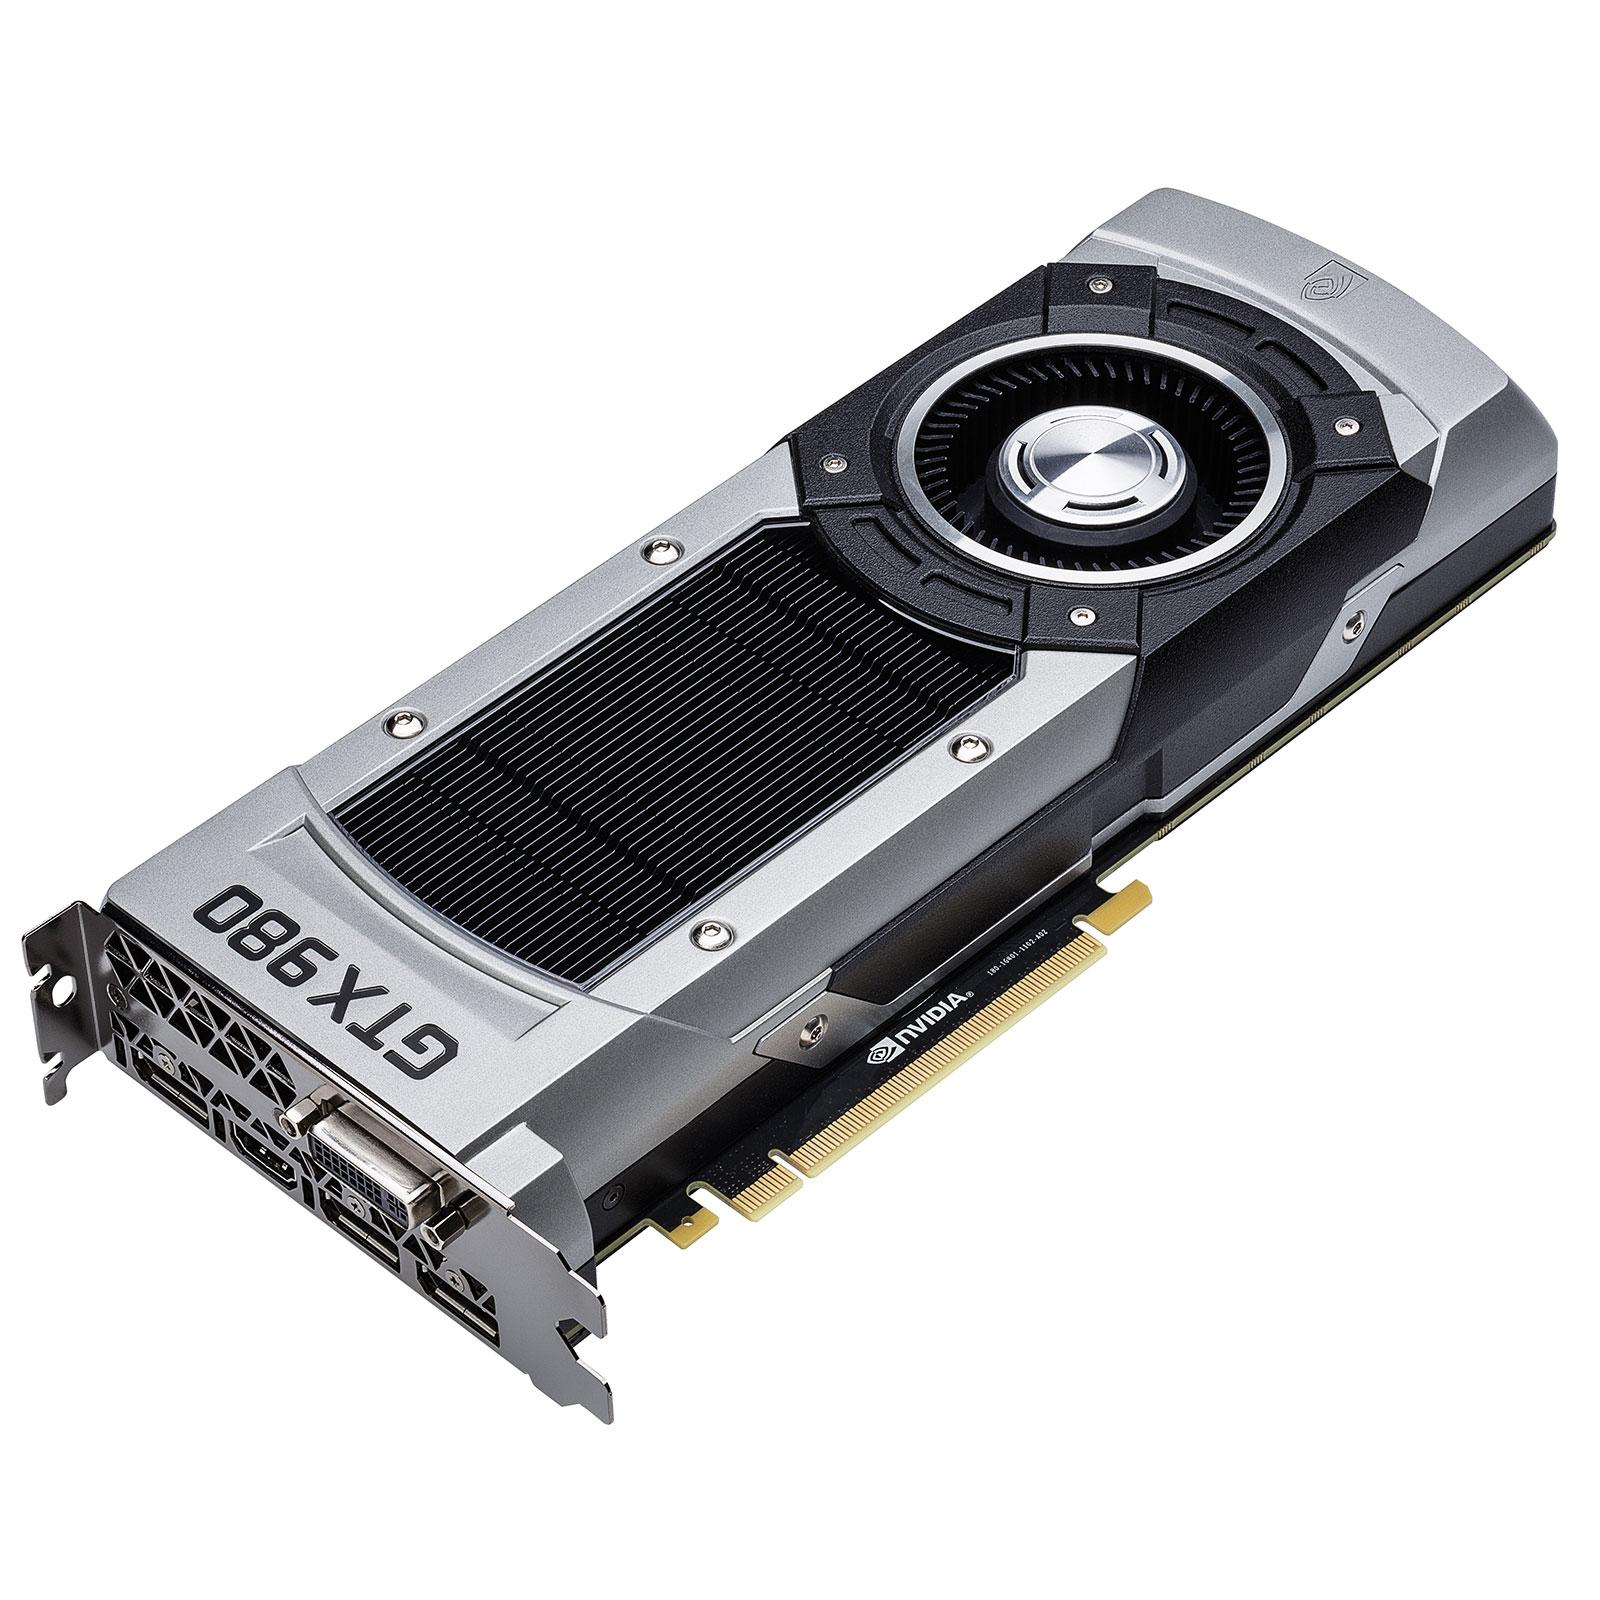 Carte graphique Gigabyte GV-N980D5-4GD-B - GeForce GTX 980 4 Go 4096 Mo DVI/HDMI/Tri DisplayPort - PCI Express (NVIDIA GeForce avec CUDA GTX 980)